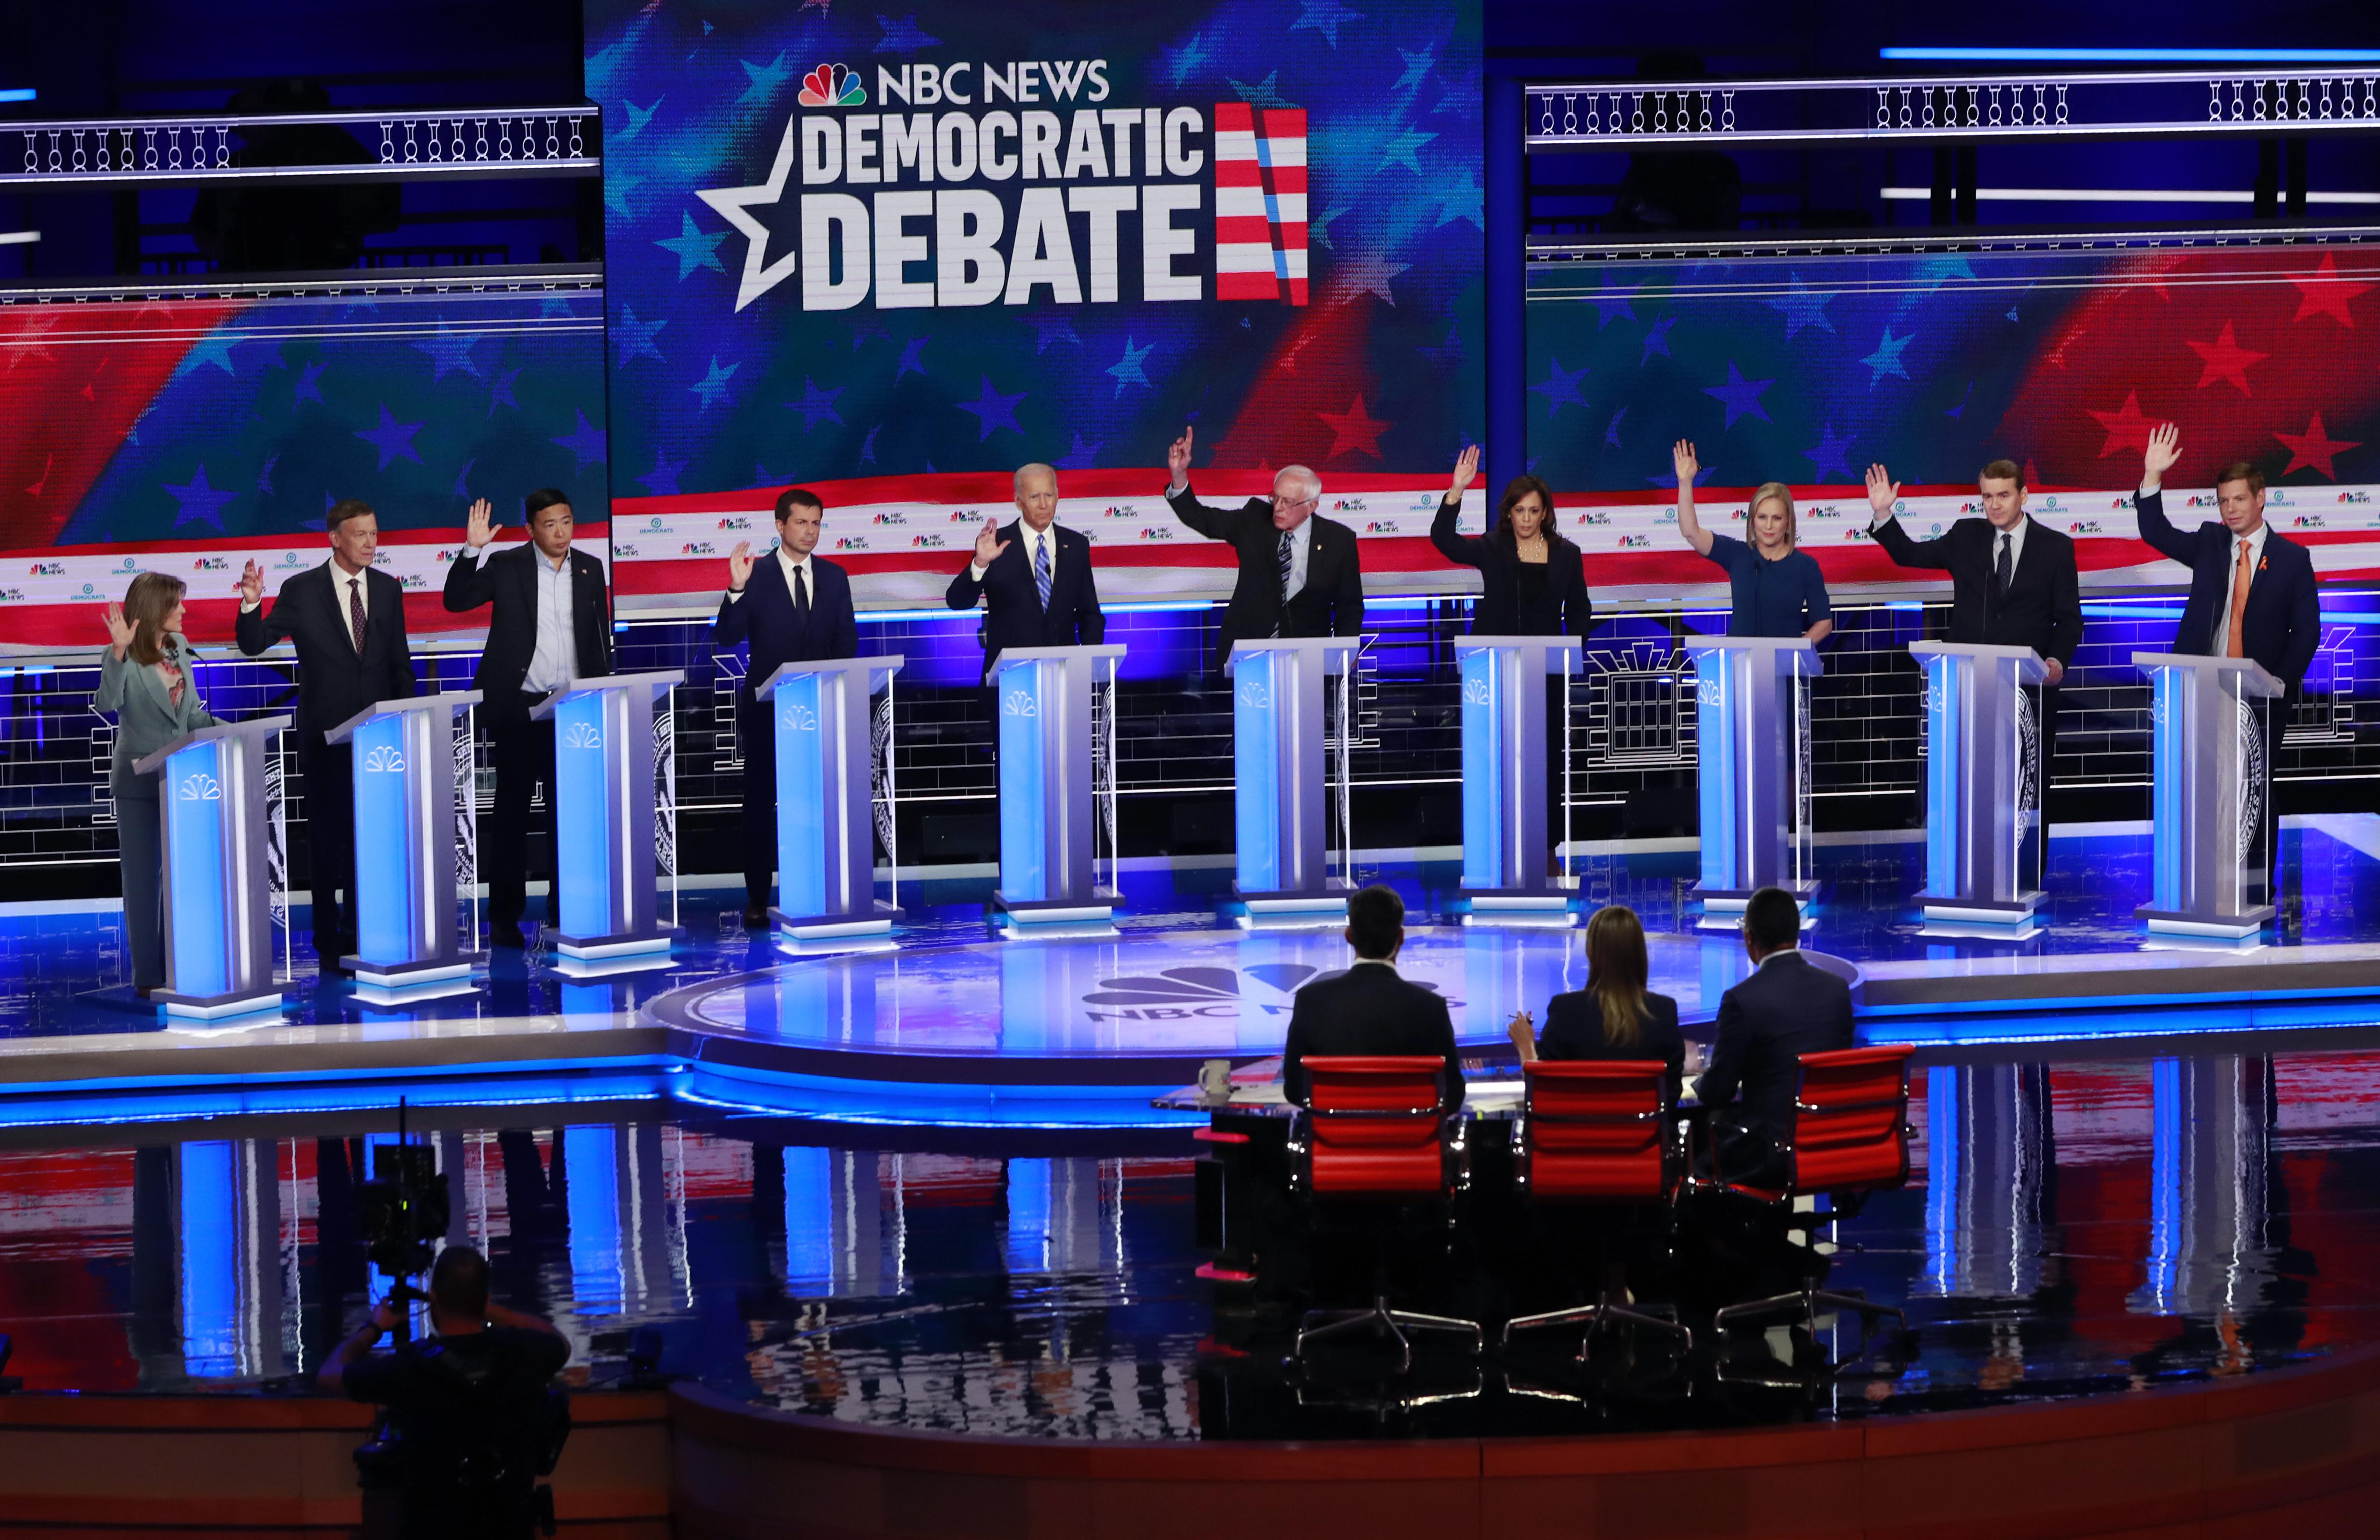 Democrats Debate Doctrine Dreadfully